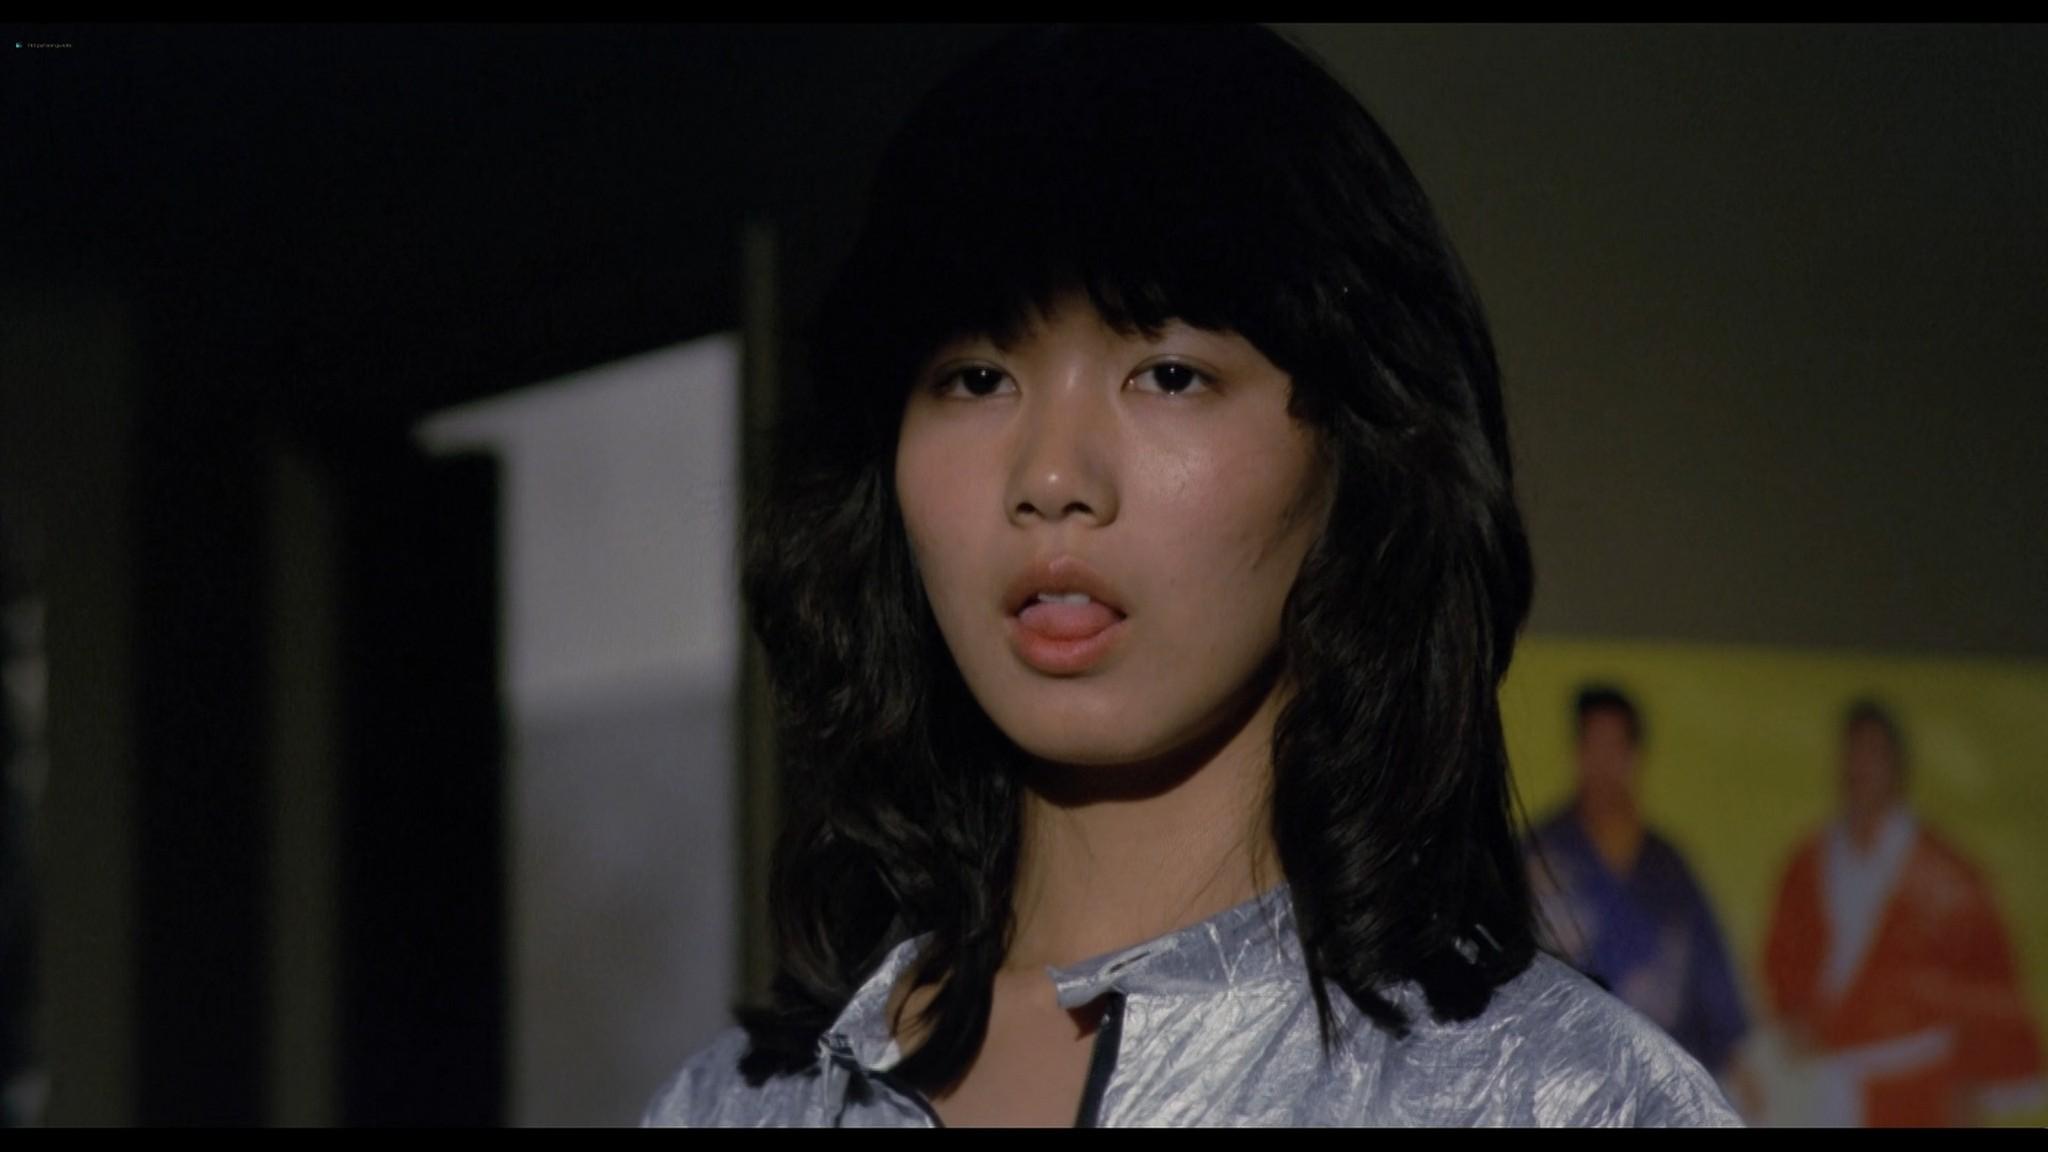 Natsuko Yamamoto nude Kaoru Oda nude lot of sex Beautiful Wrestlers Down for the Count JP 1984 1080p BluRay REMUX 8